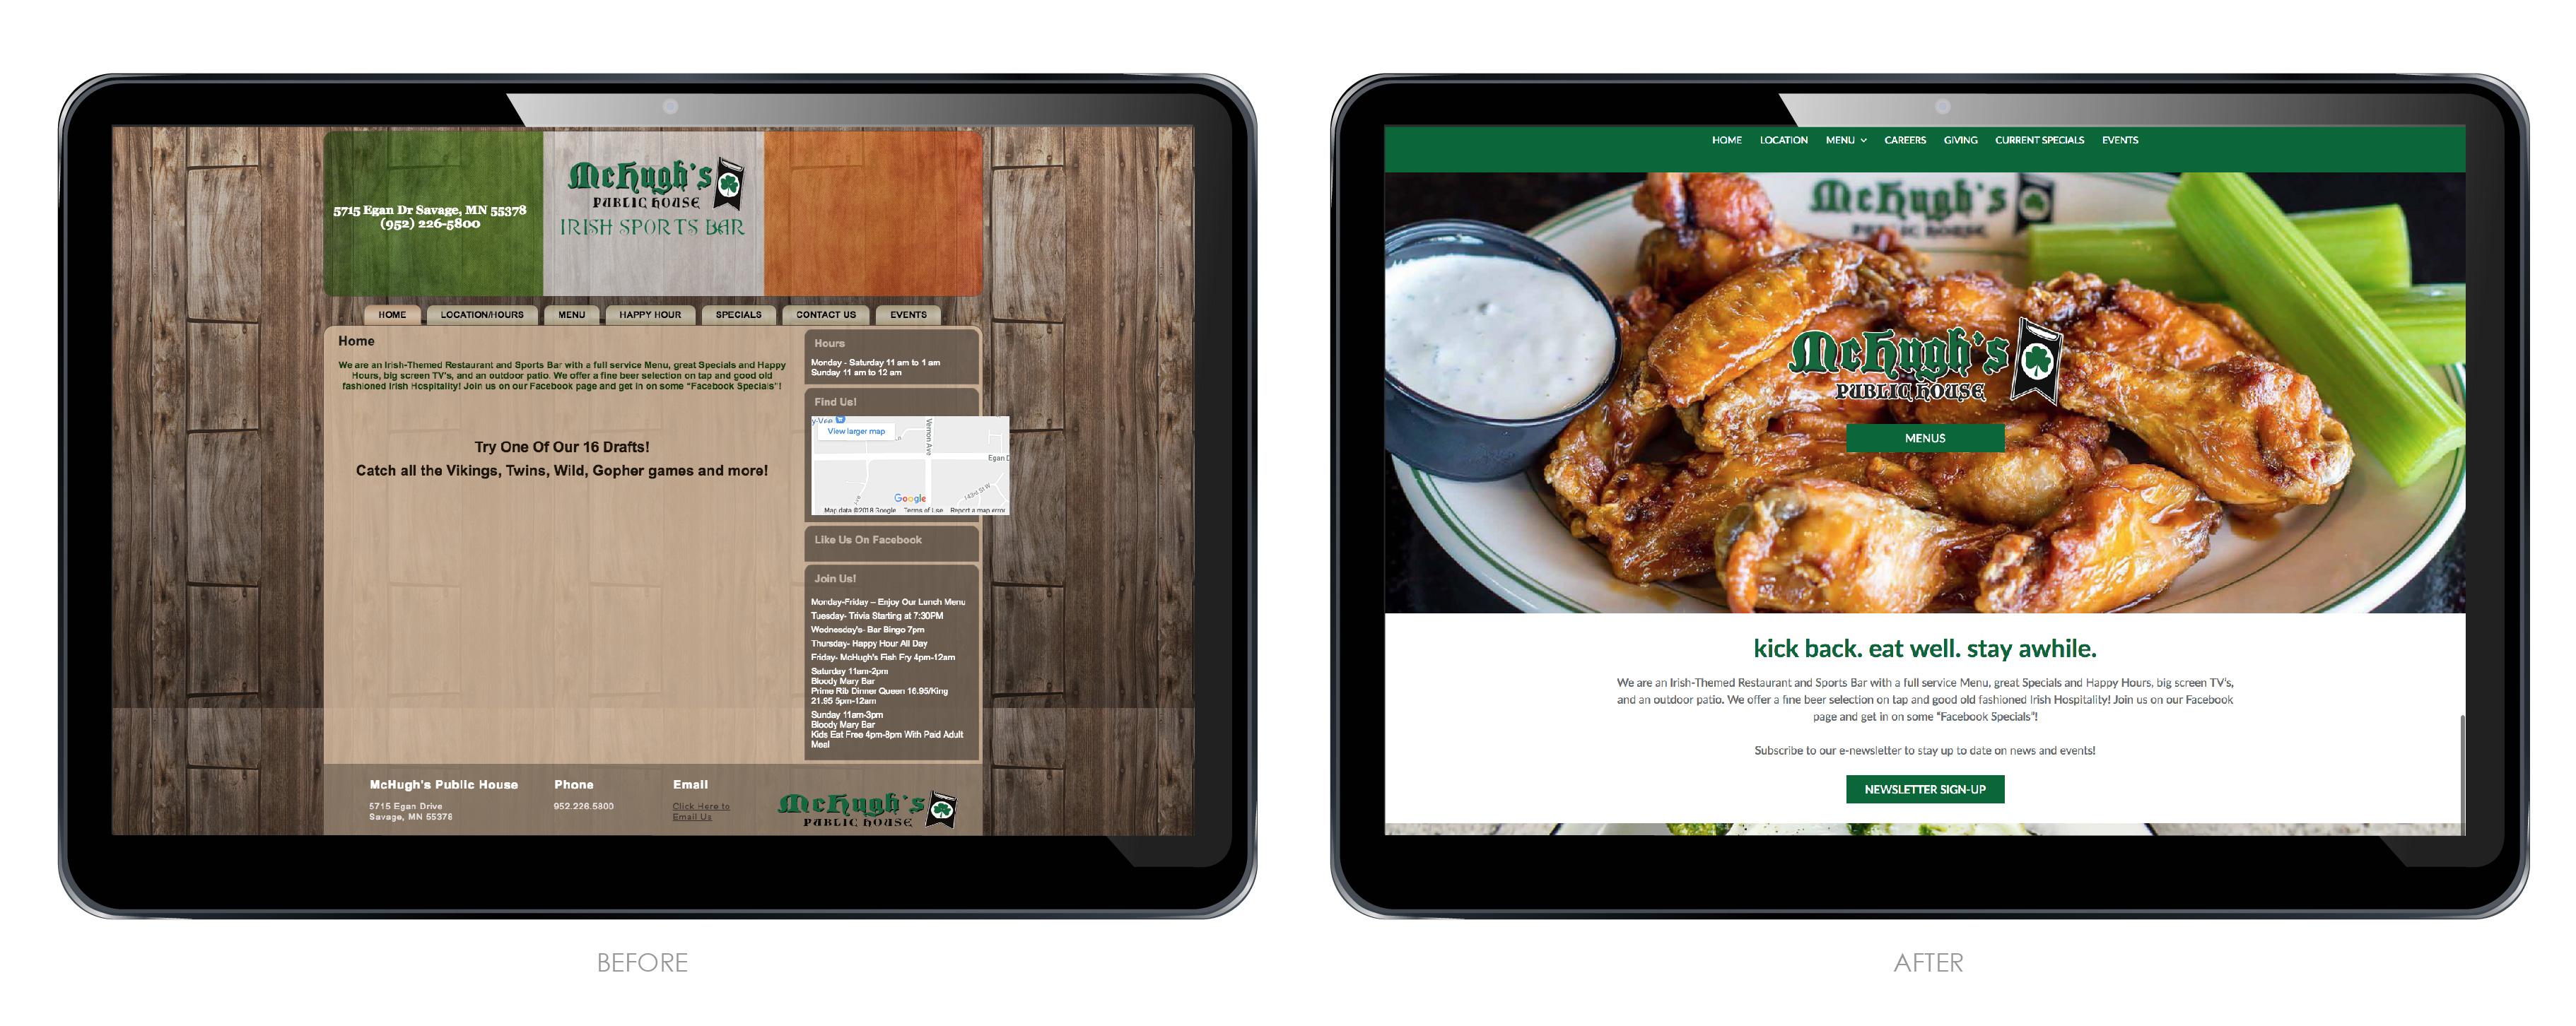 McHughs Public House Restaurant Website Redesign